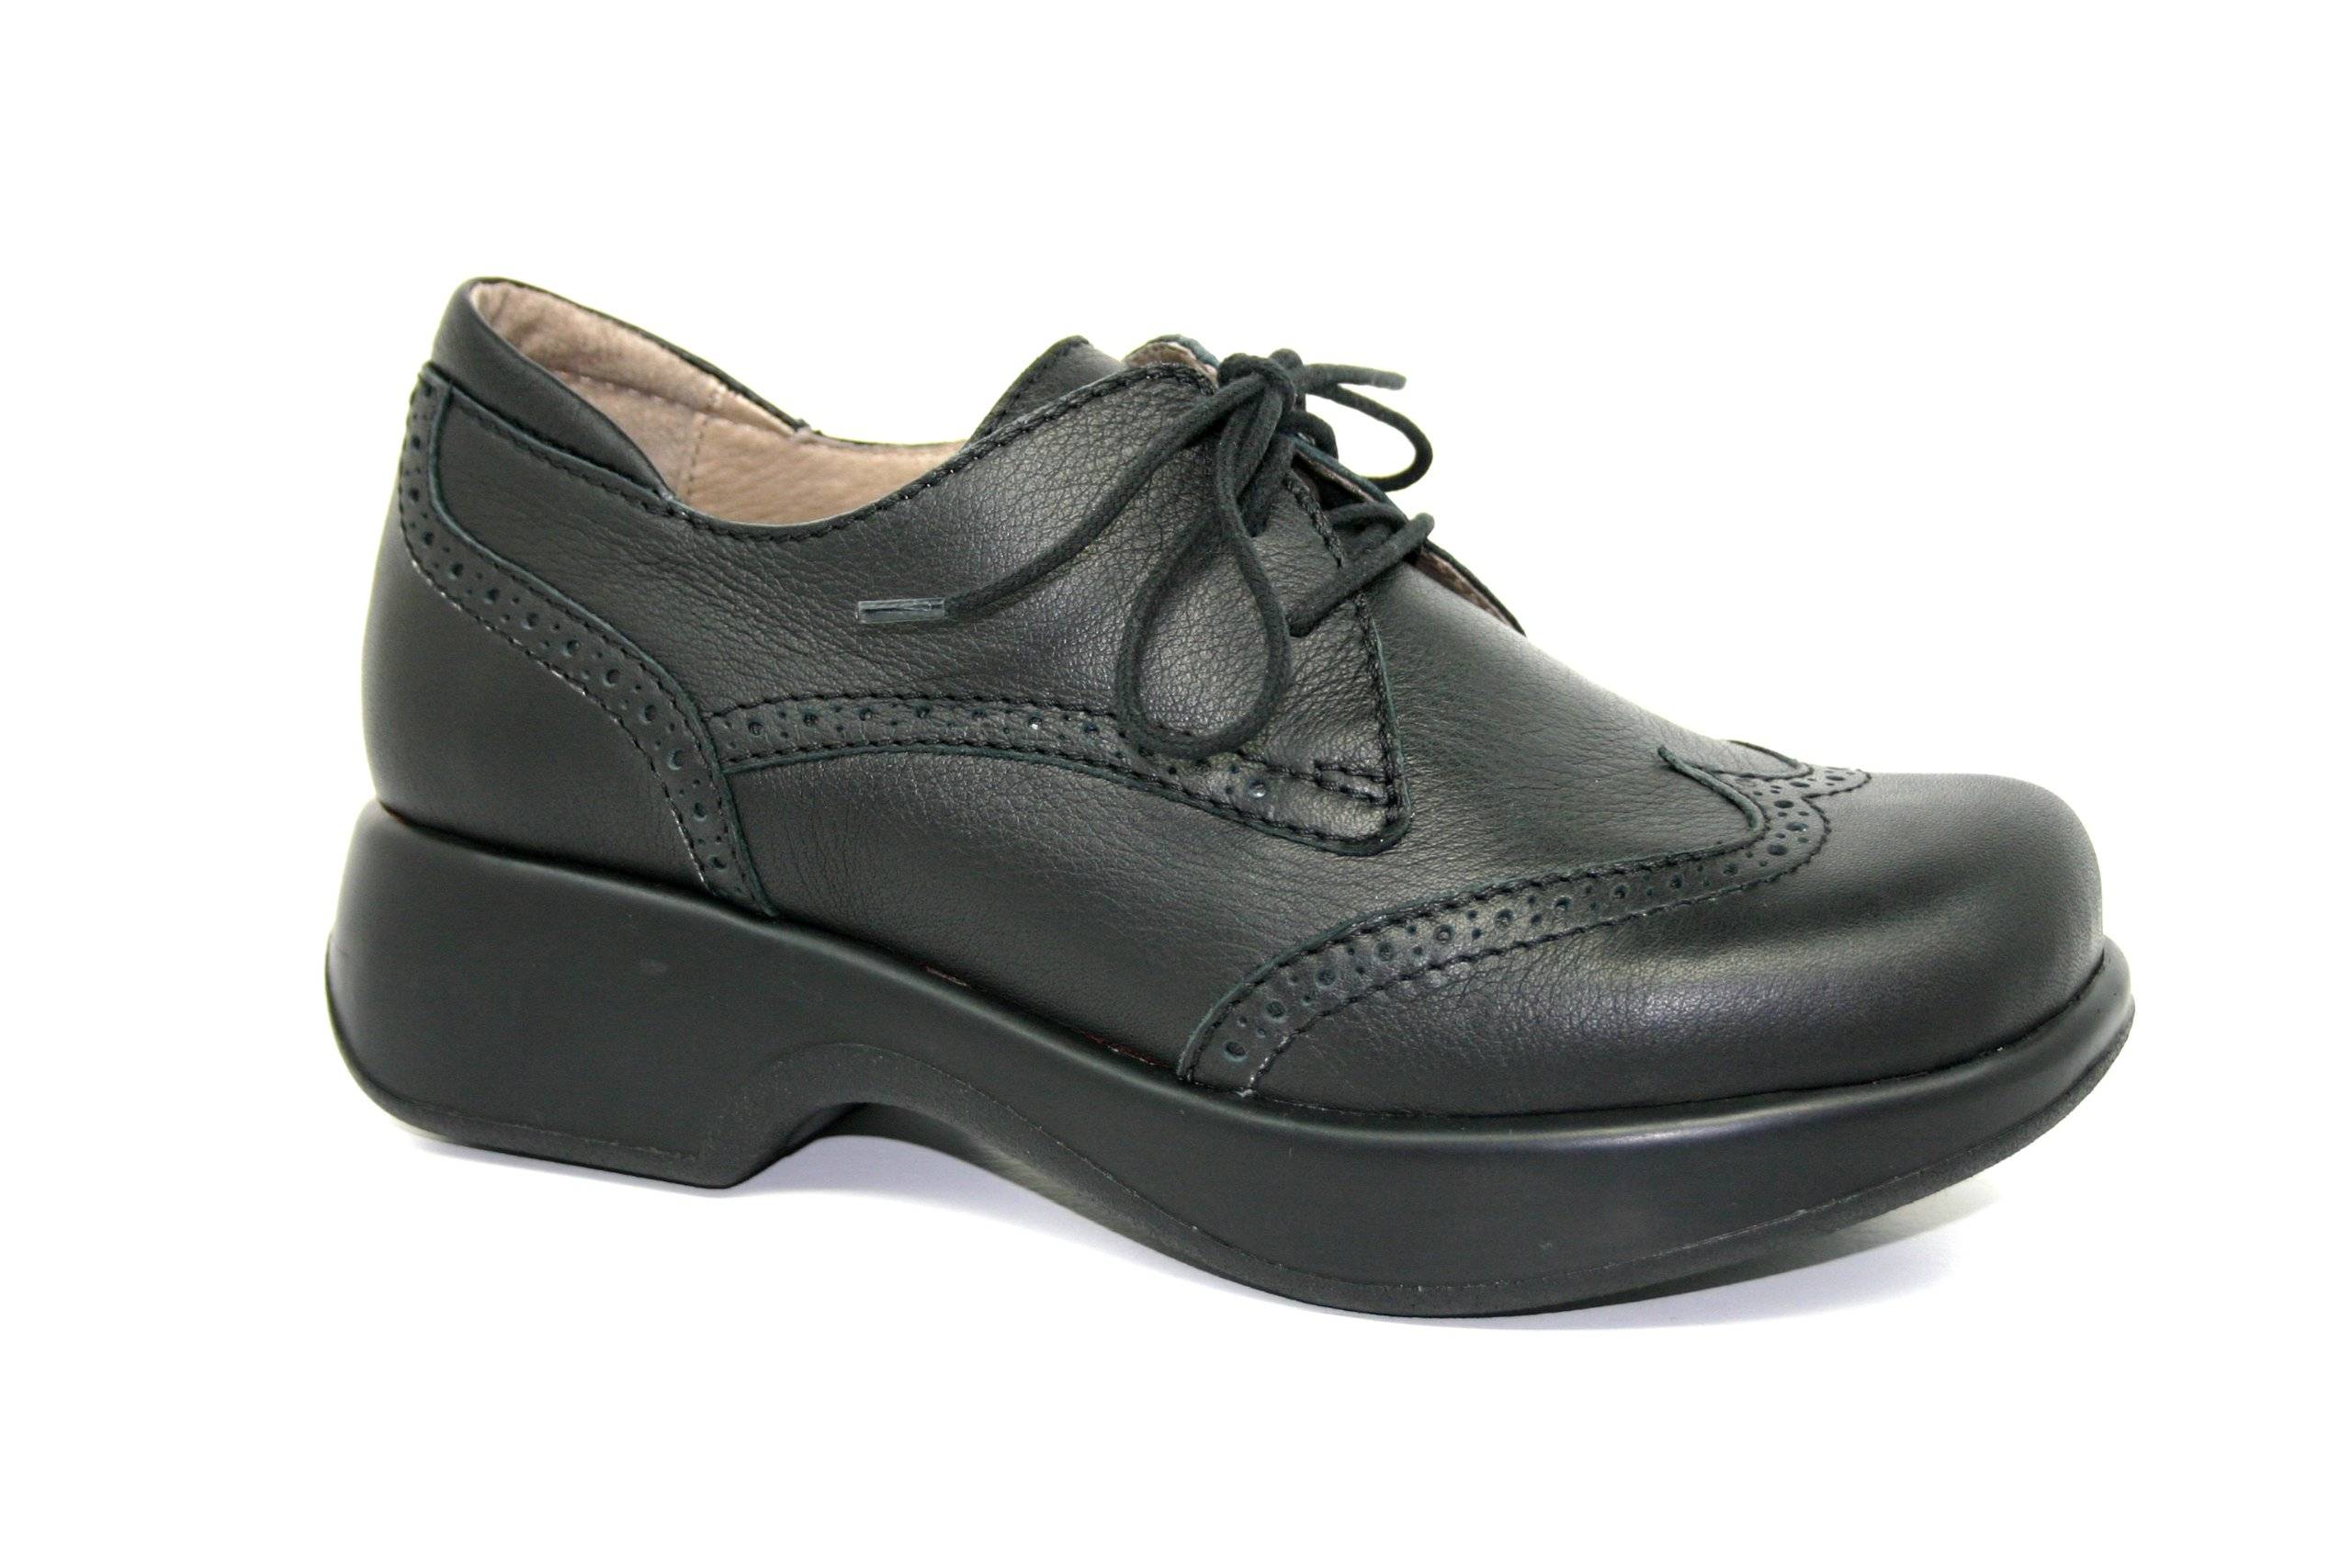 Dromedaris Women's Hornbill Platform Shoes,Black,39 M EU